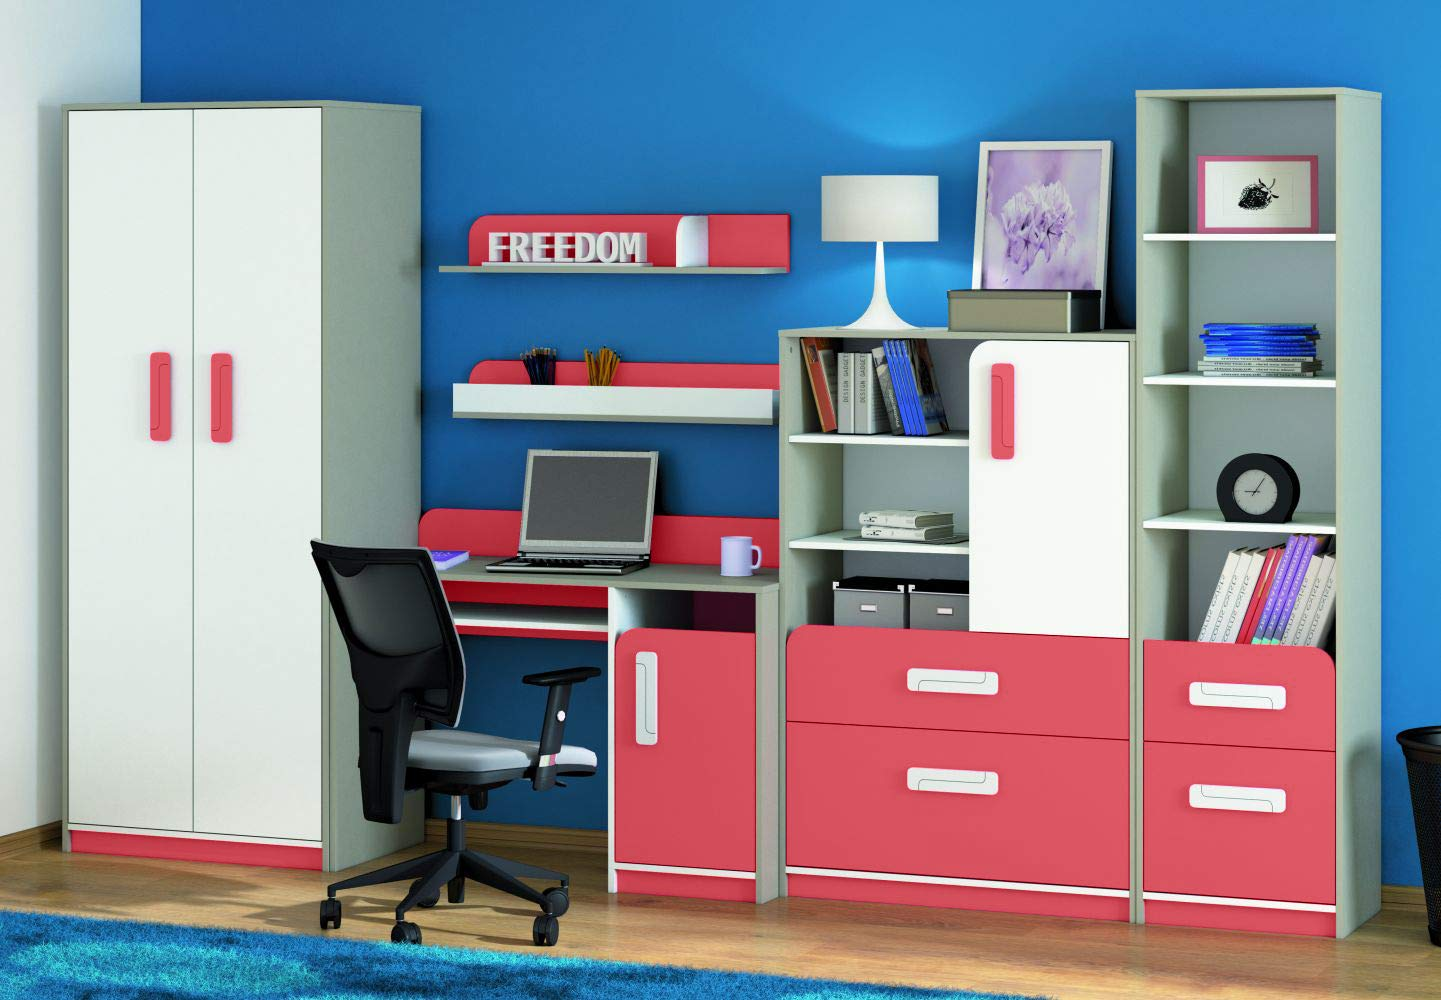 Kinderzimmer Set C Renton, 6-teilig, Farbe  Platingrau Weißszlig; Himbeerrot